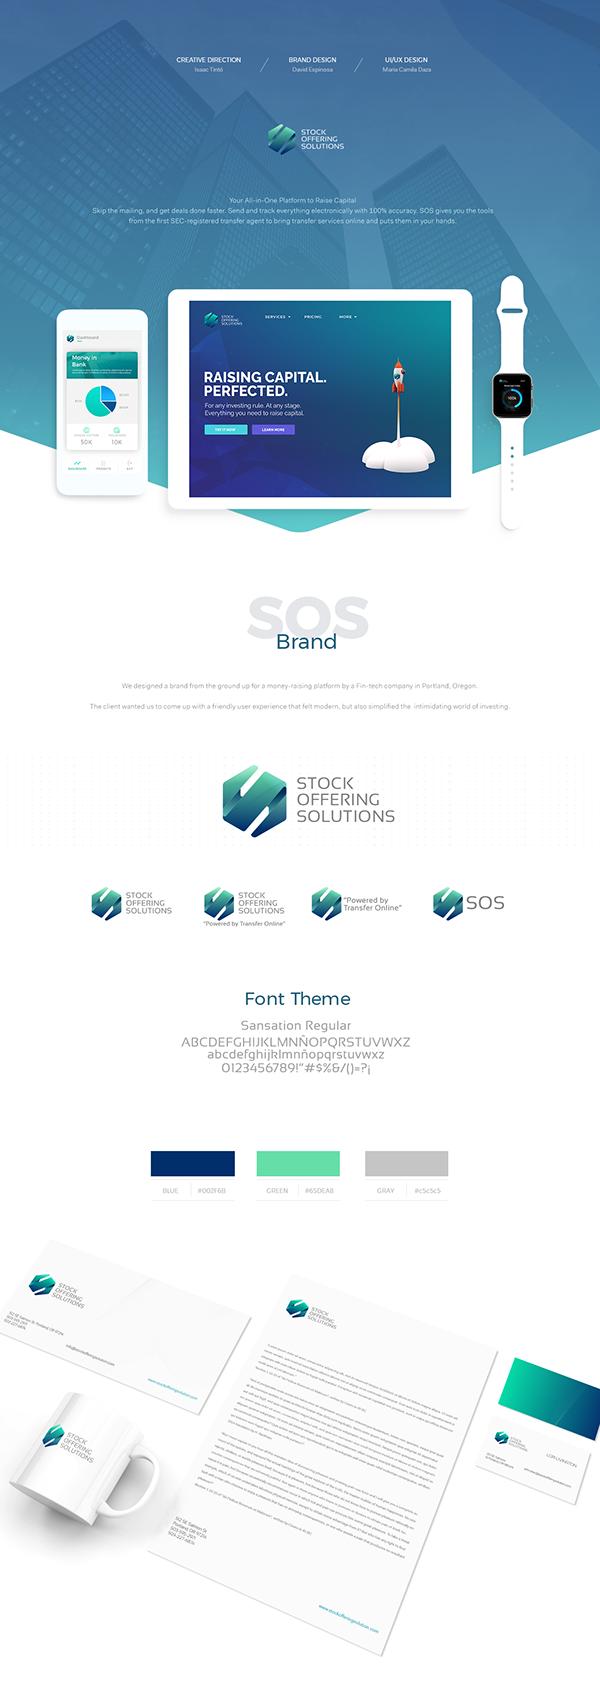 Stock Offering Solutions Crowdfunding Platform